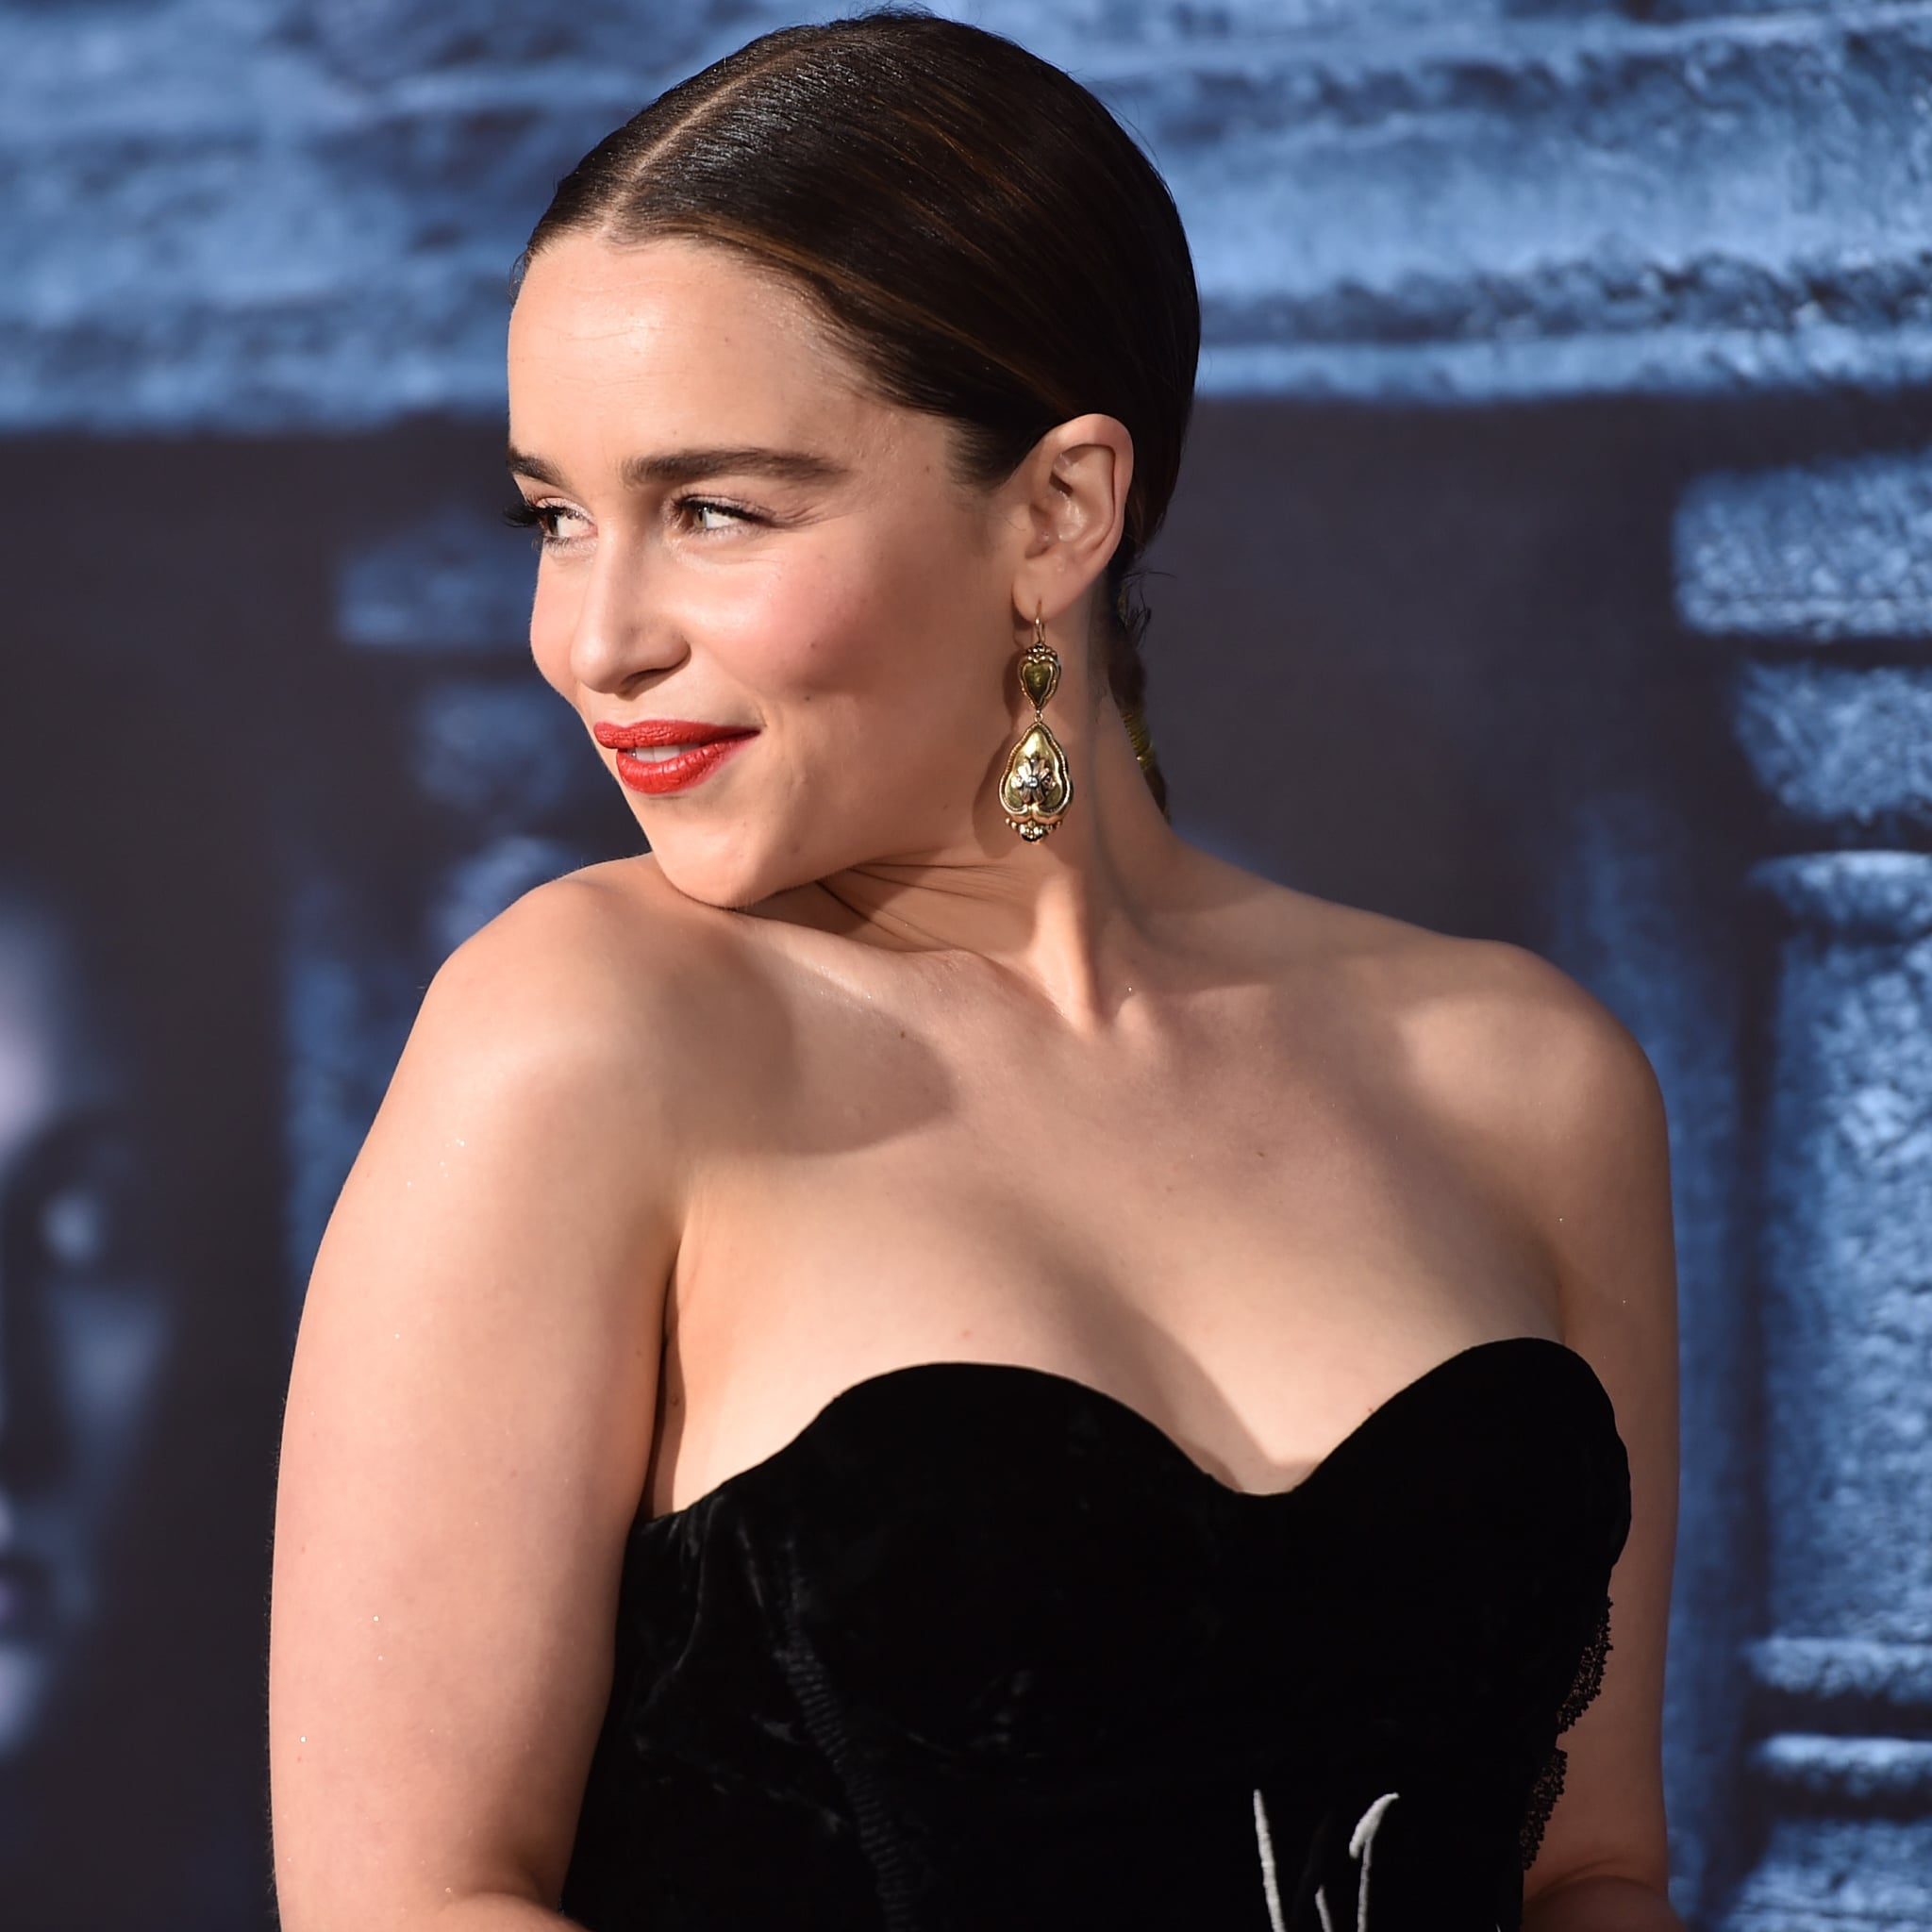 Hot Emilia Clarke Pictures Popsugar Celebrity